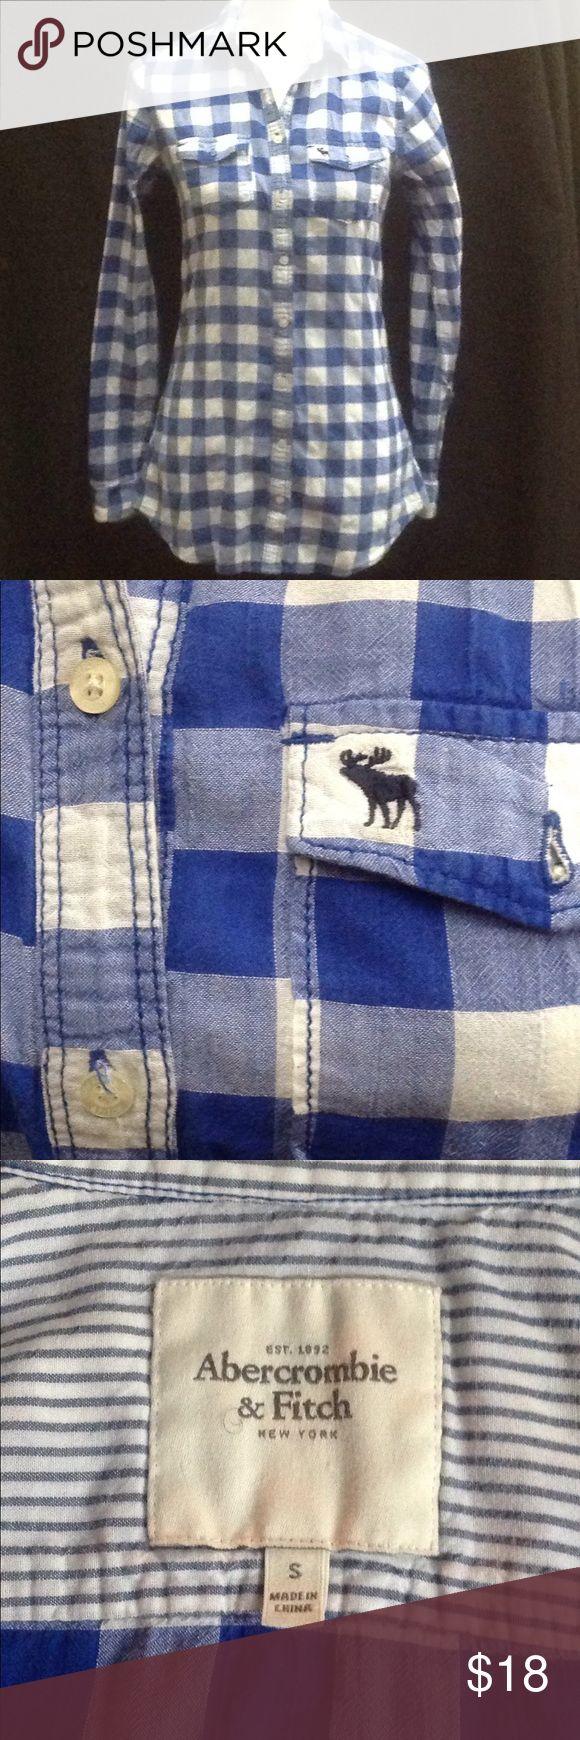 ABERCROMBIE Women's Button down shirt, SZ Small ABERCROMBIE & FITCH Women's Button-down Oxford Shirt Size Small Cornflower blue & white plaid 100% Cotton Excellent Condition Abercrombie & Fitch Tops Button Down Shirts